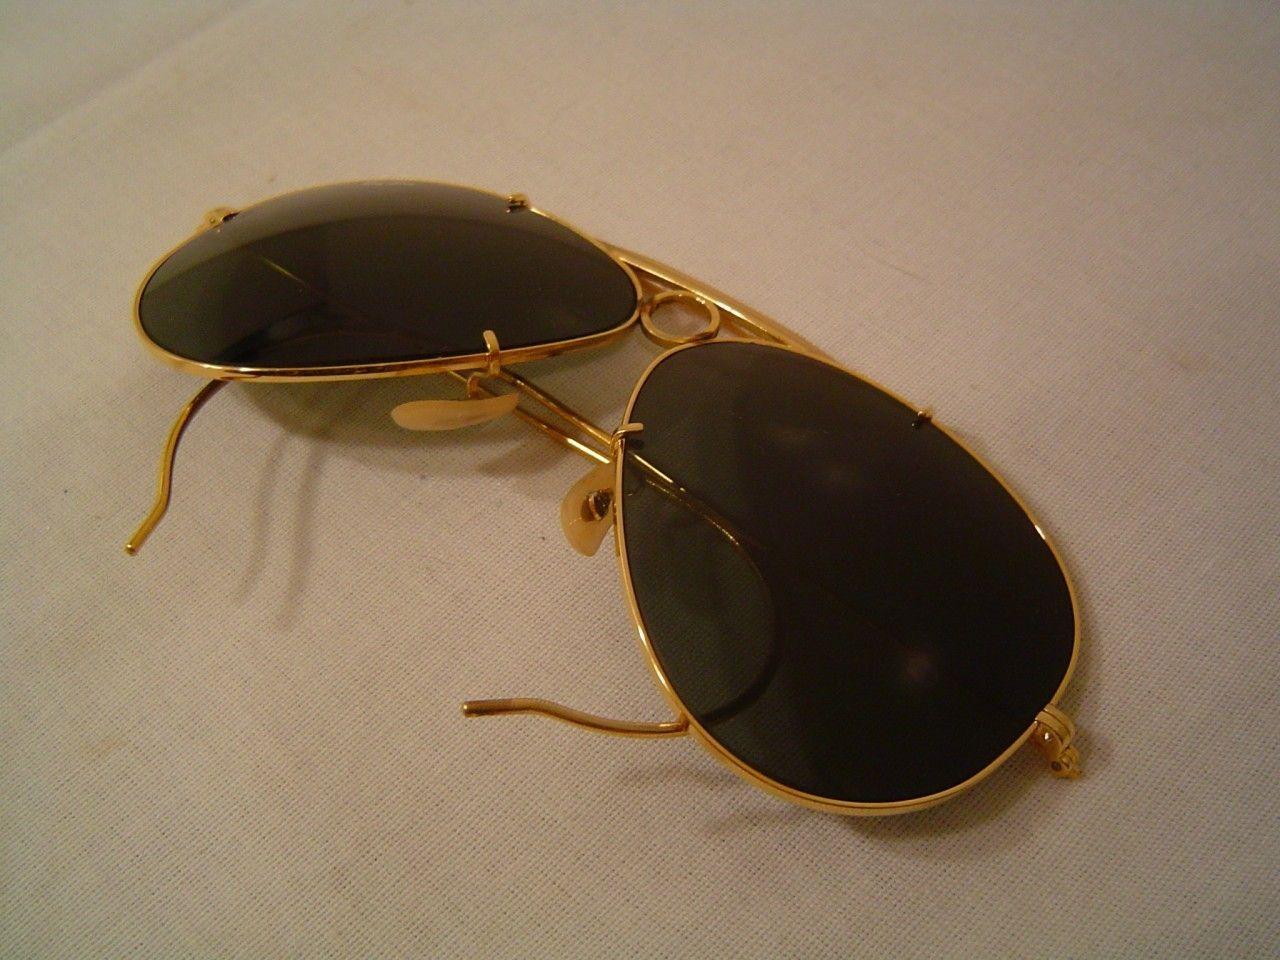 15125b911 Vintage Ray Ban Aviator Sunglasses w/ Wraparound Earpieces BL B | eBay. Do  you